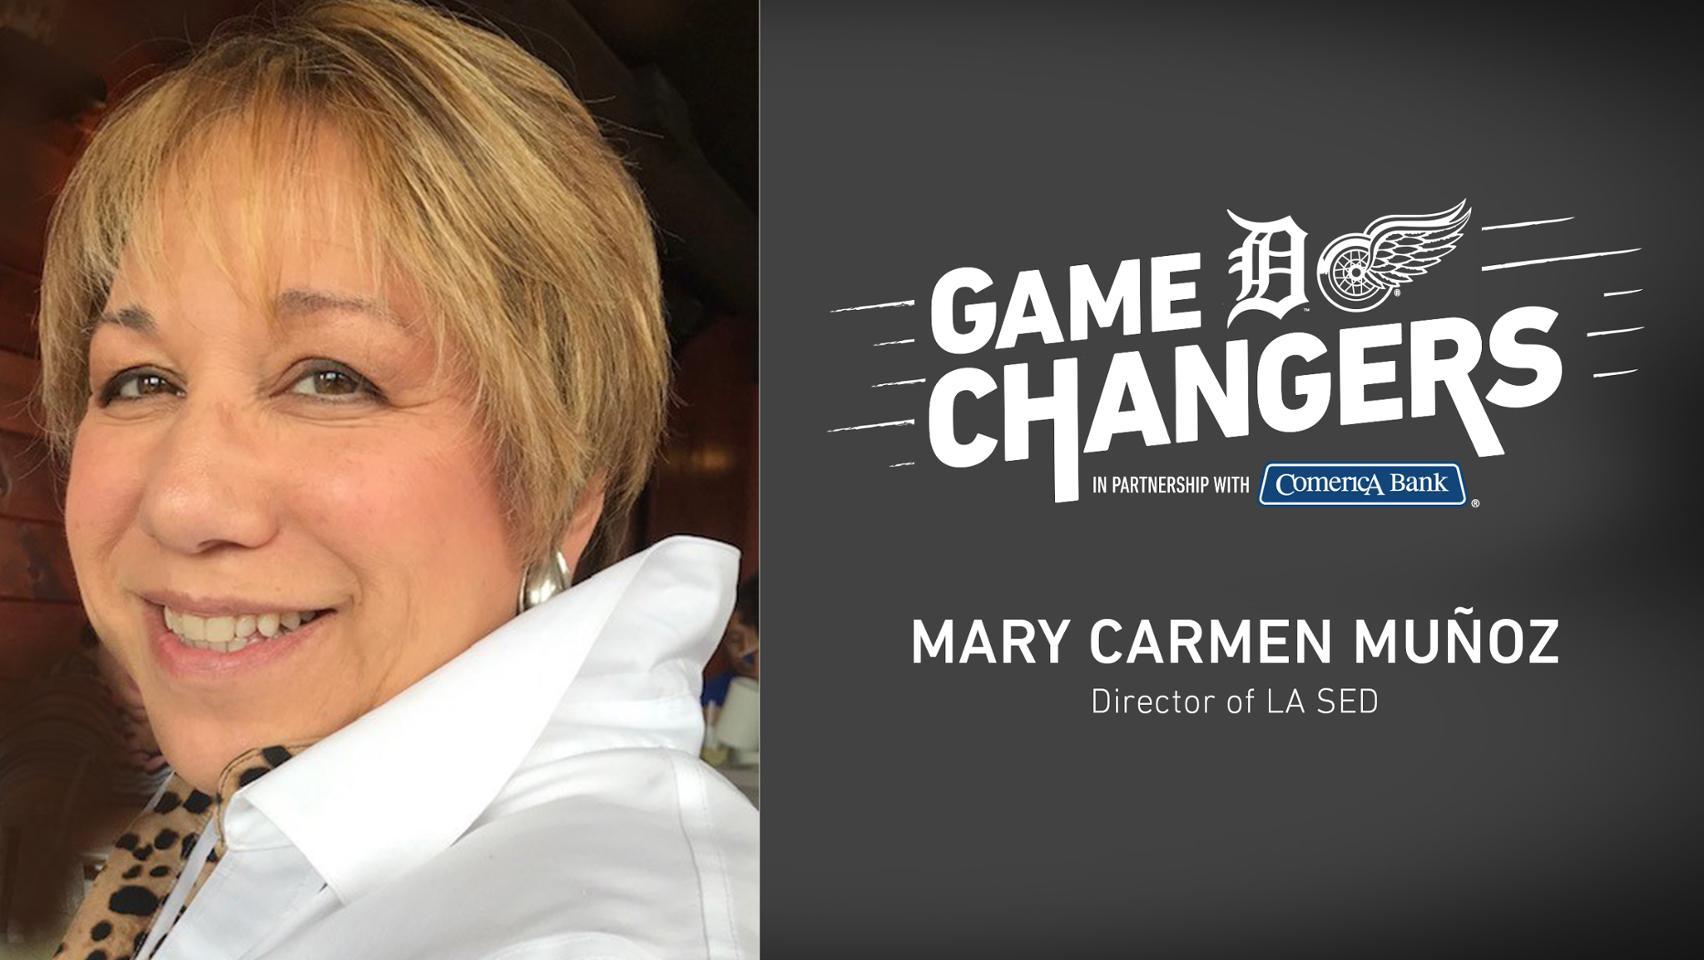 Mary Carmen Munoz